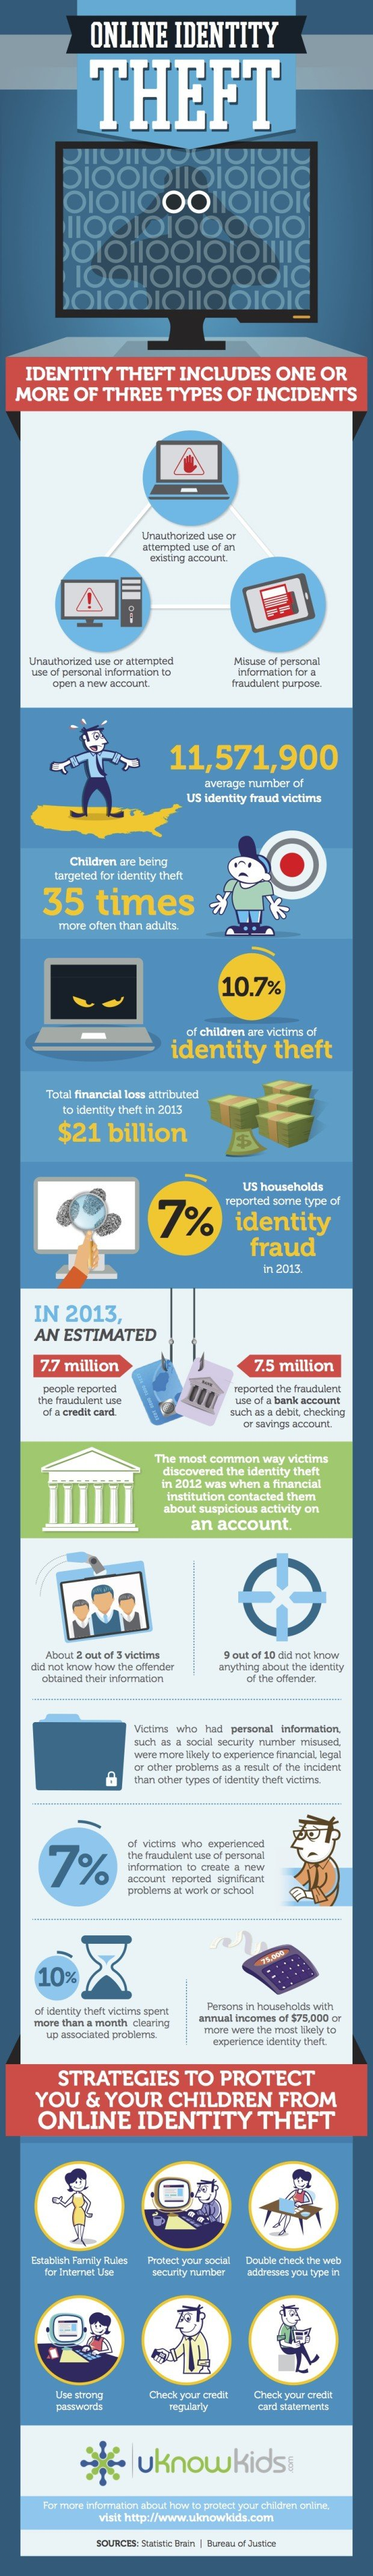 Online-Identity-Theft-infographic